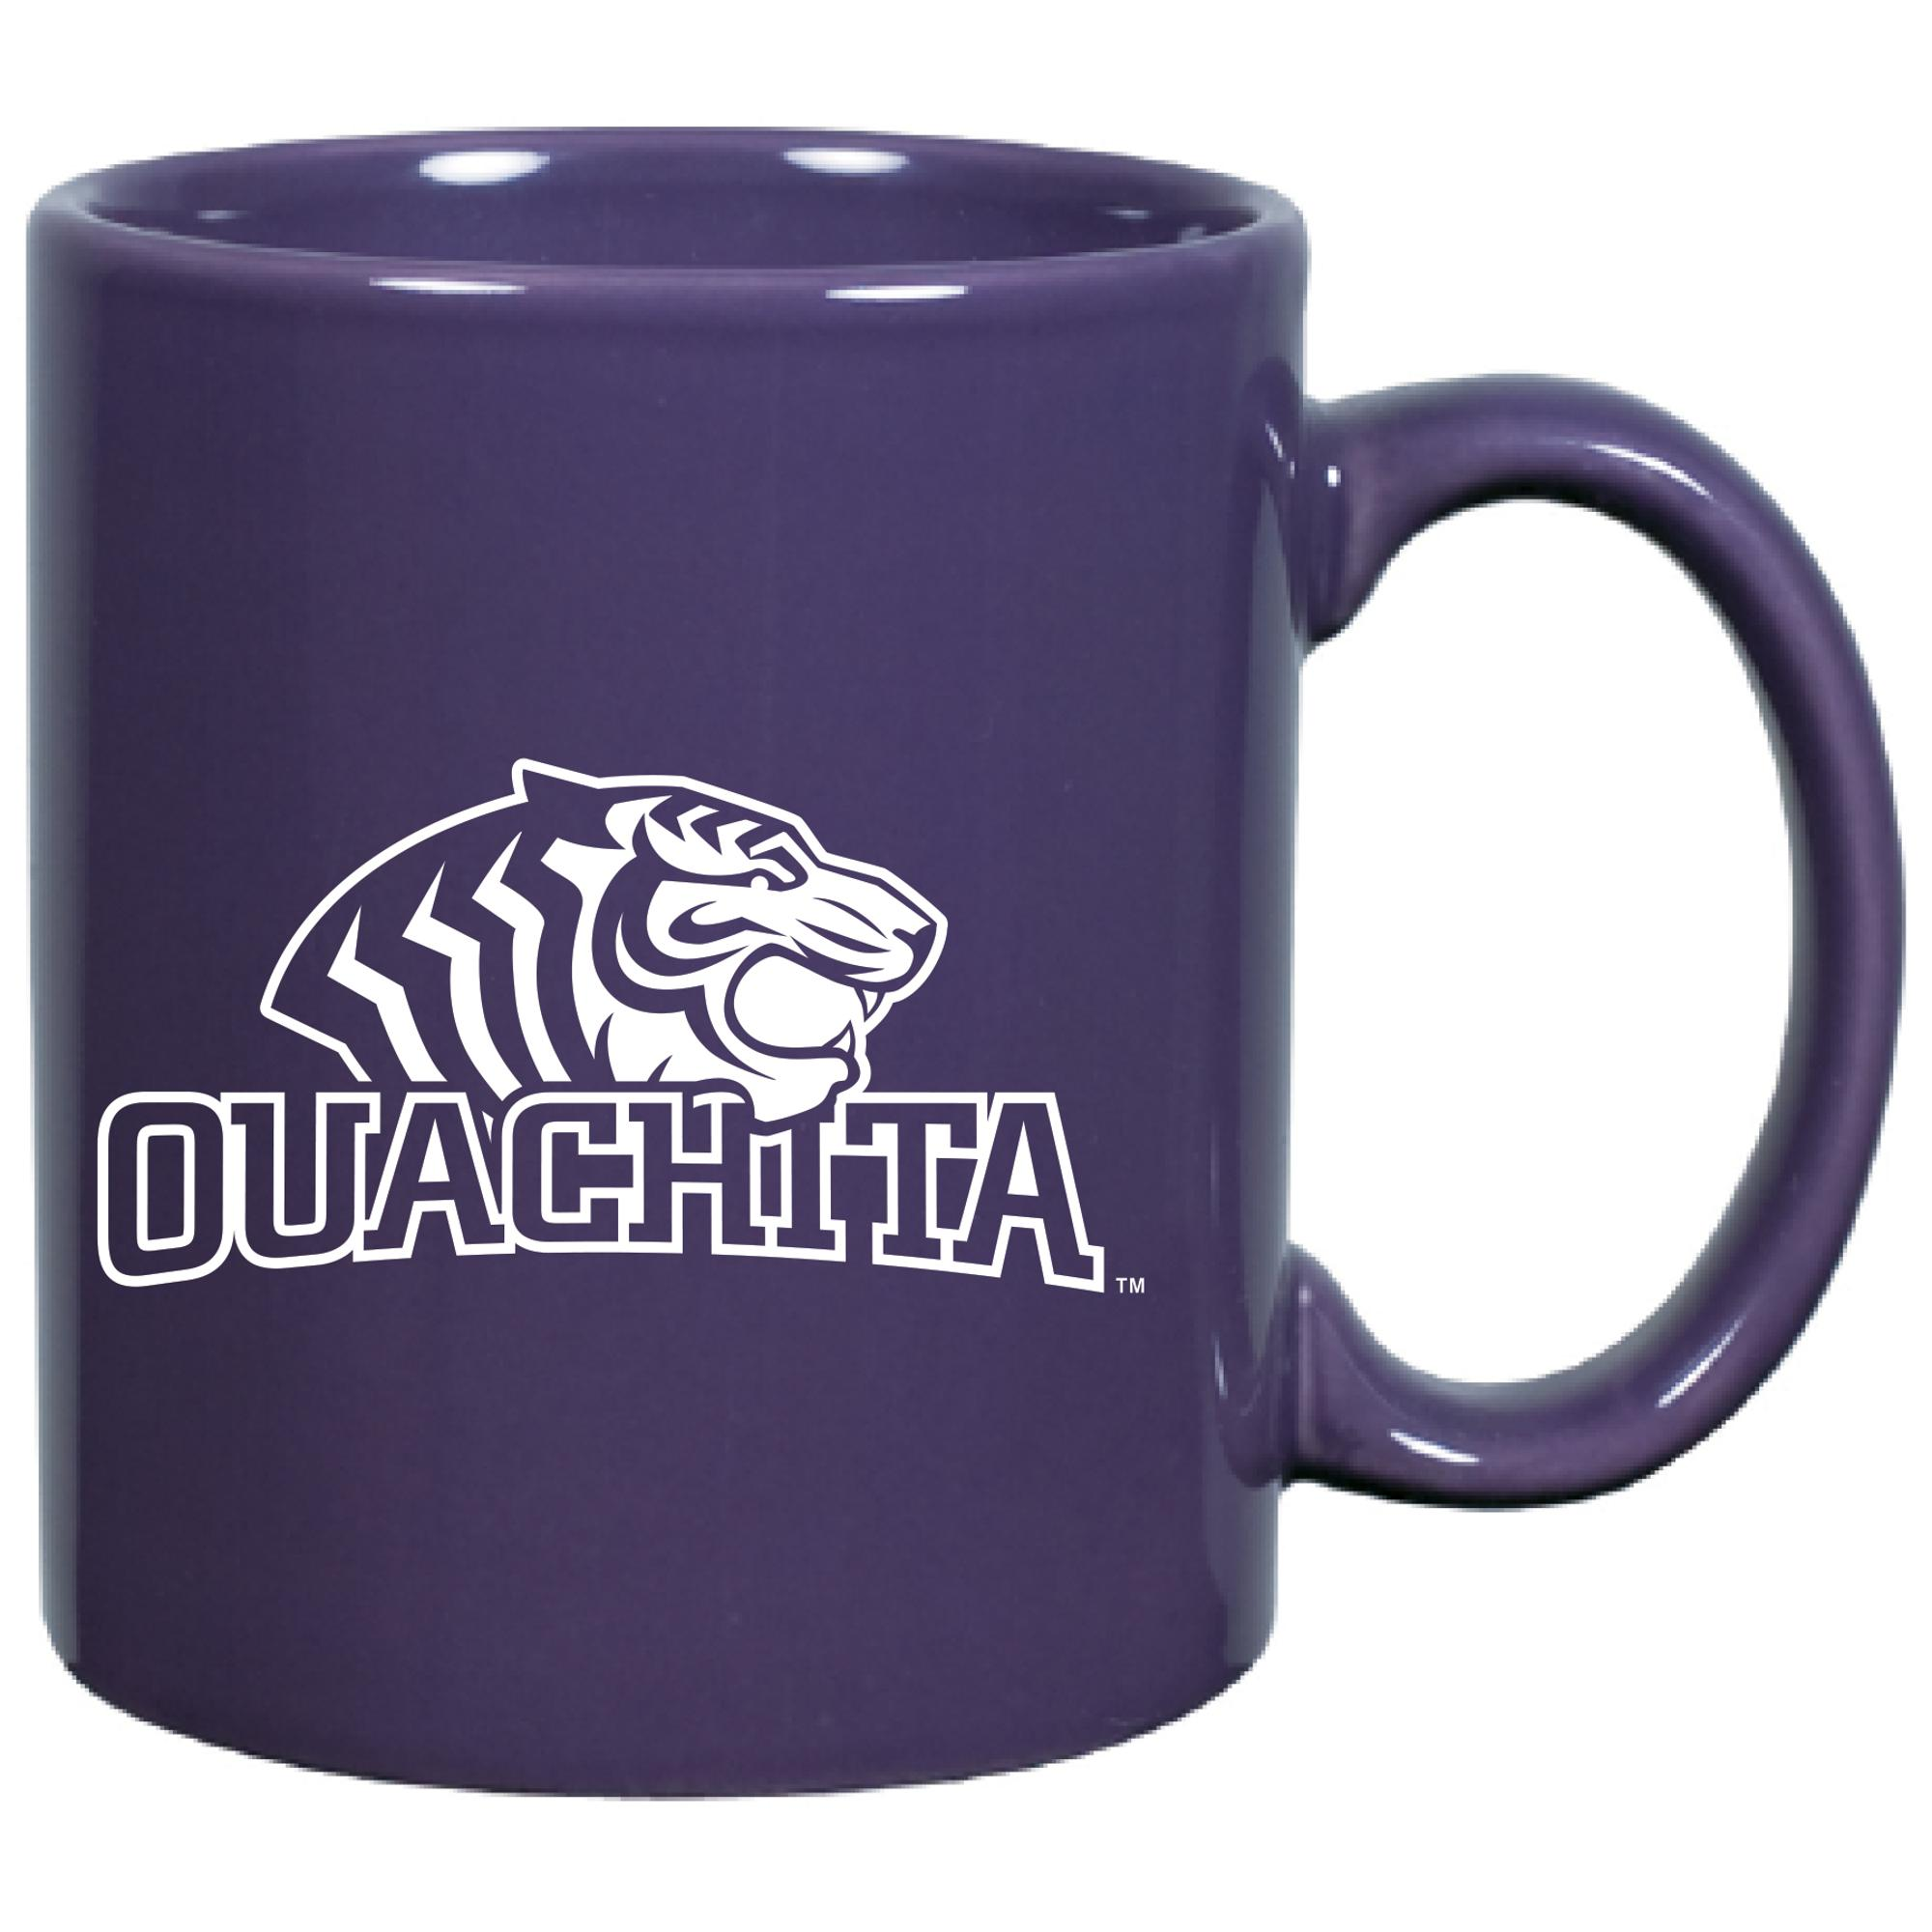 image of: Ouachita 11oz Coffee Mug